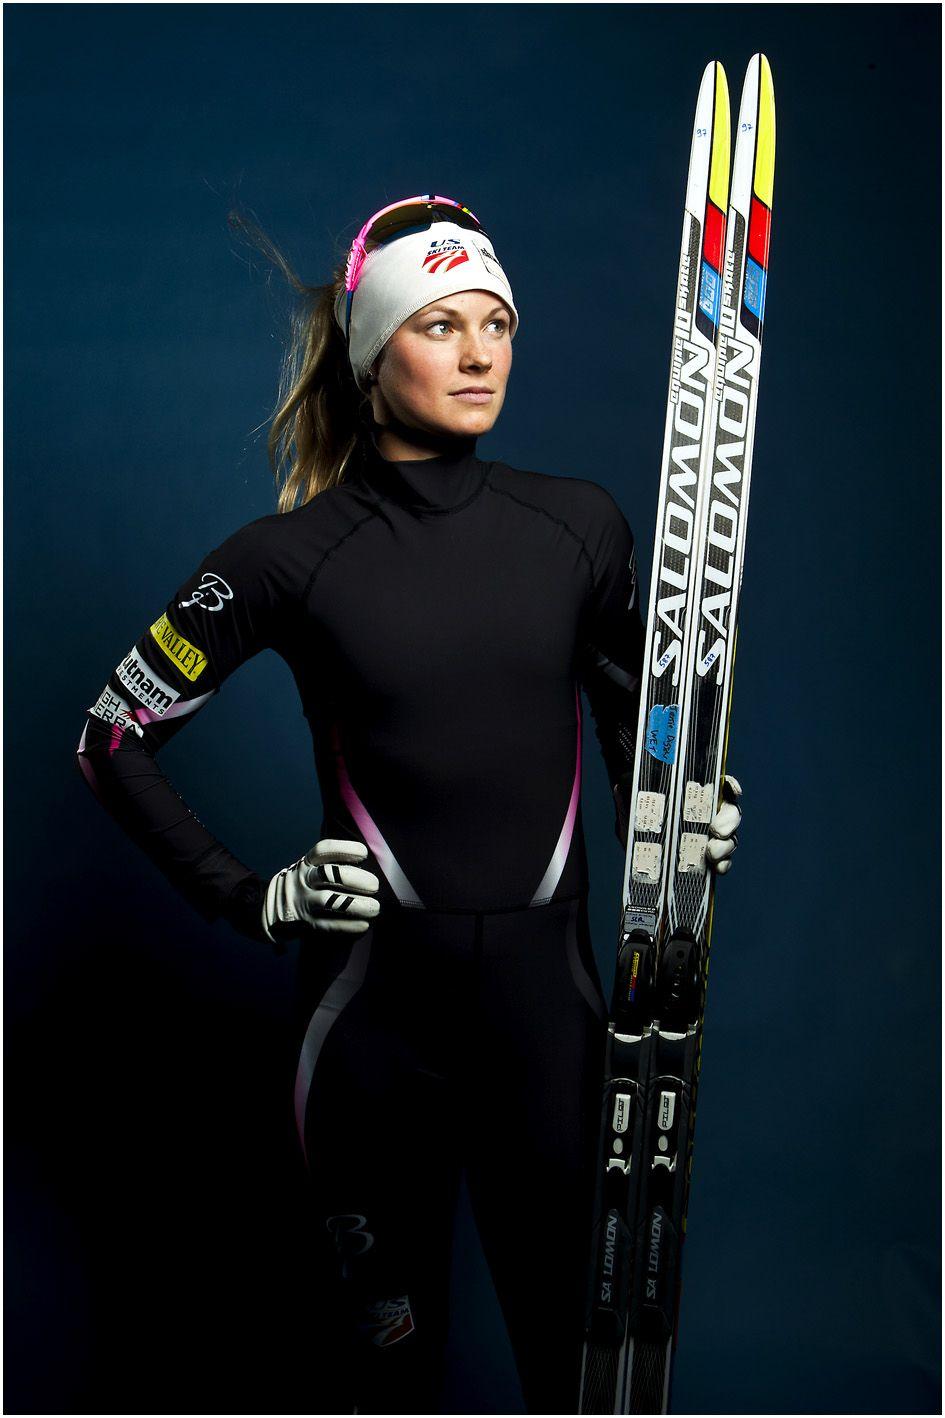 Sochi Olympic Athlete Portraits My Life At F22 Cross Country Skiing Outfit Cross Country Skiing Nordic Skiing